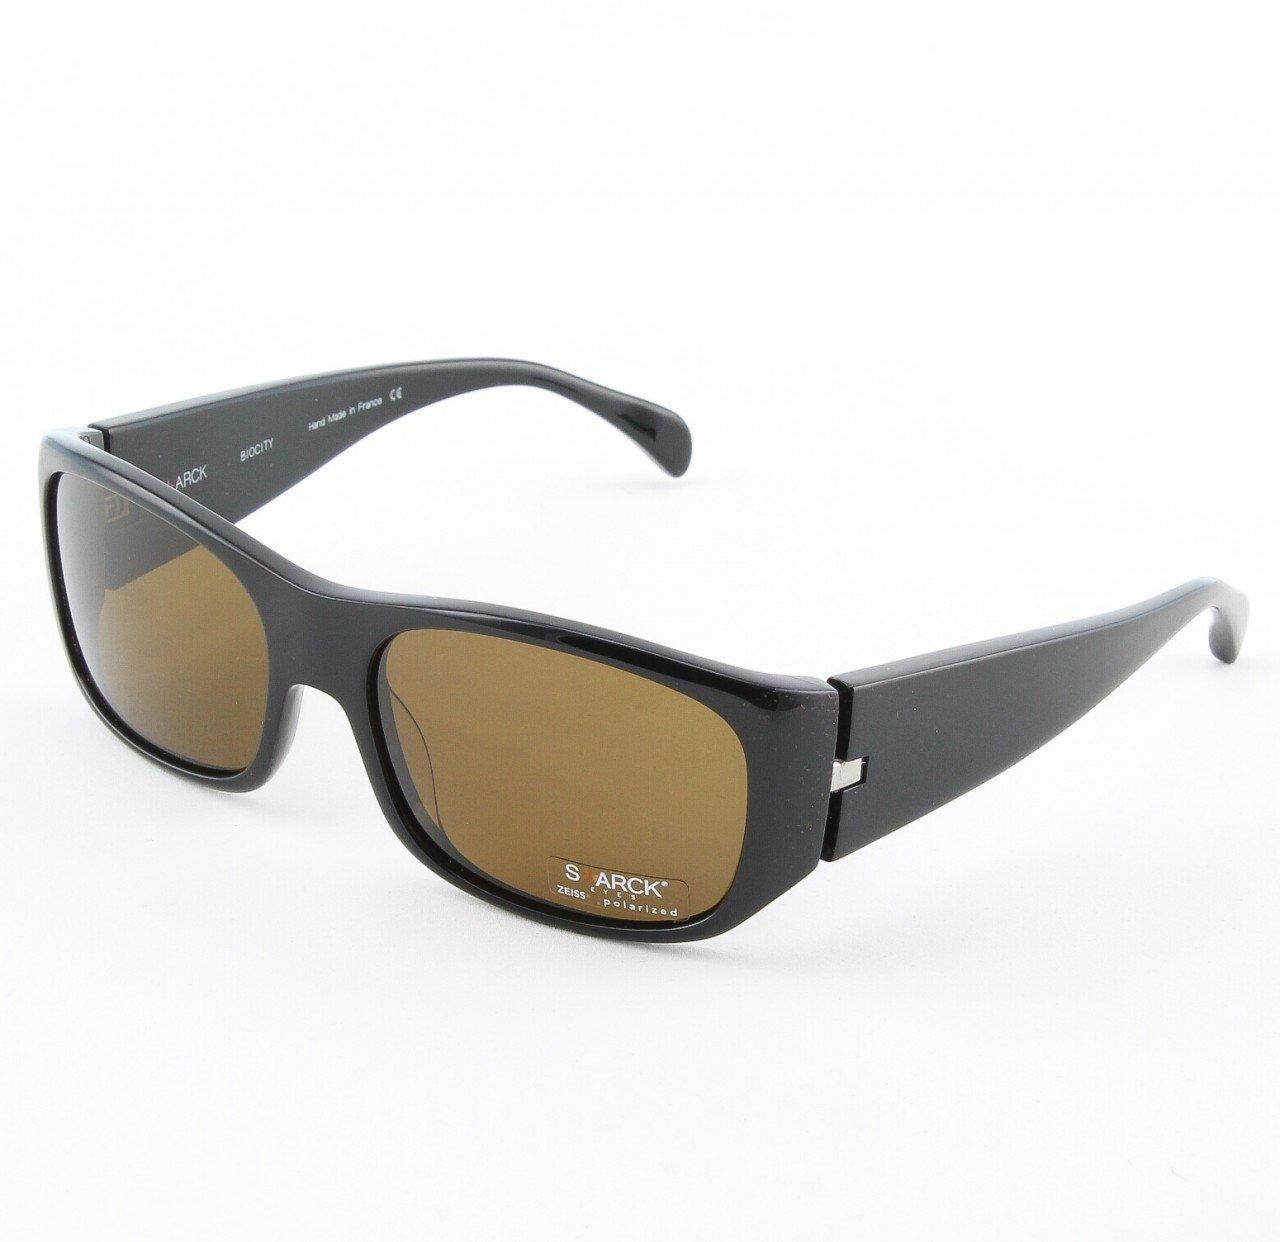 Starck Sunglasses PL0743 Col. 0002 Black with Dark Brown Polarized Lenses